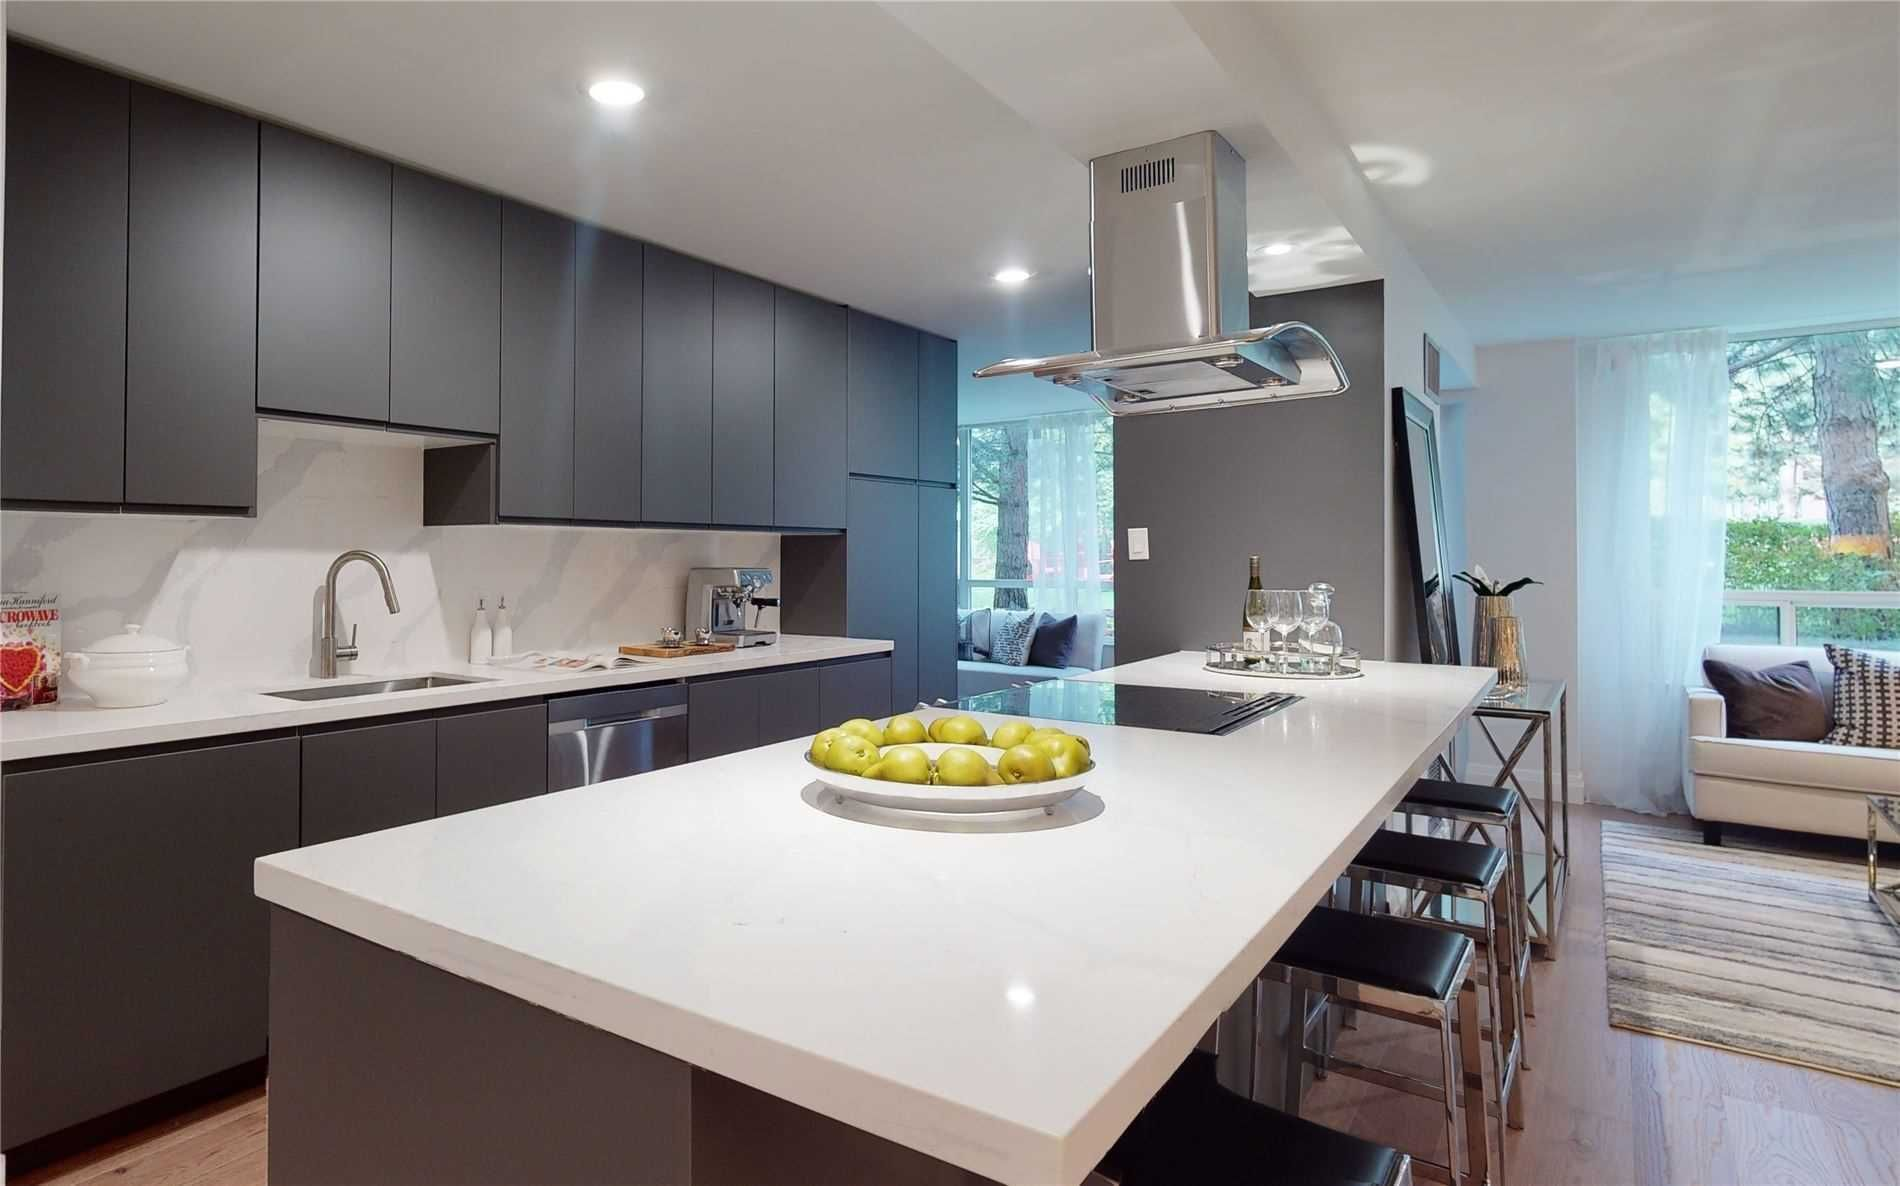 Main Photo: 118 1210 Don Mills Road in Toronto: Banbury-Don Mills Condo for sale (Toronto C13)  : MLS®# C4907113